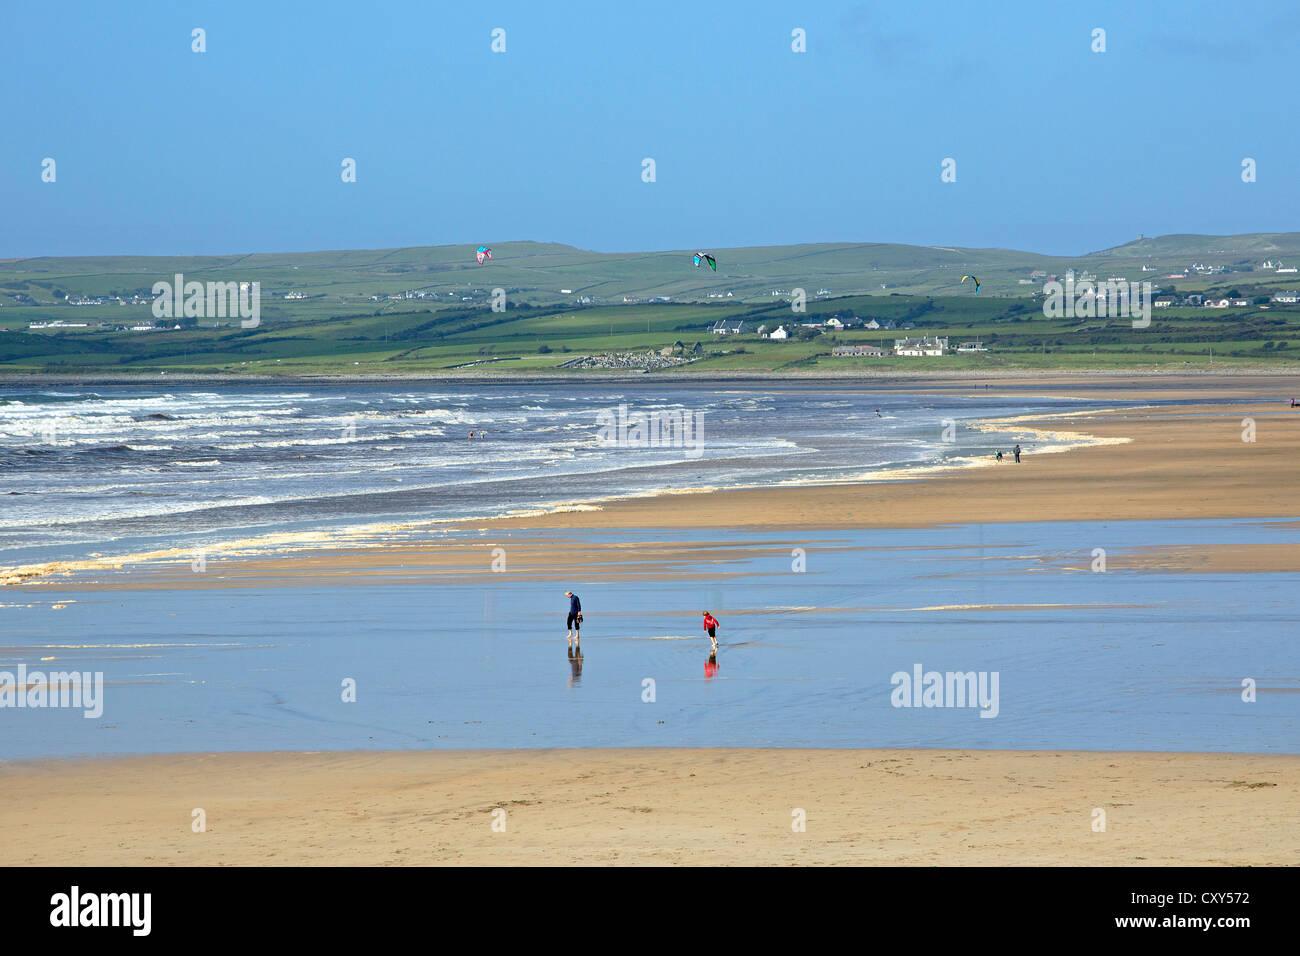 beach, Lahinch, Co. Clare, Republic of Ireland - Stock Image